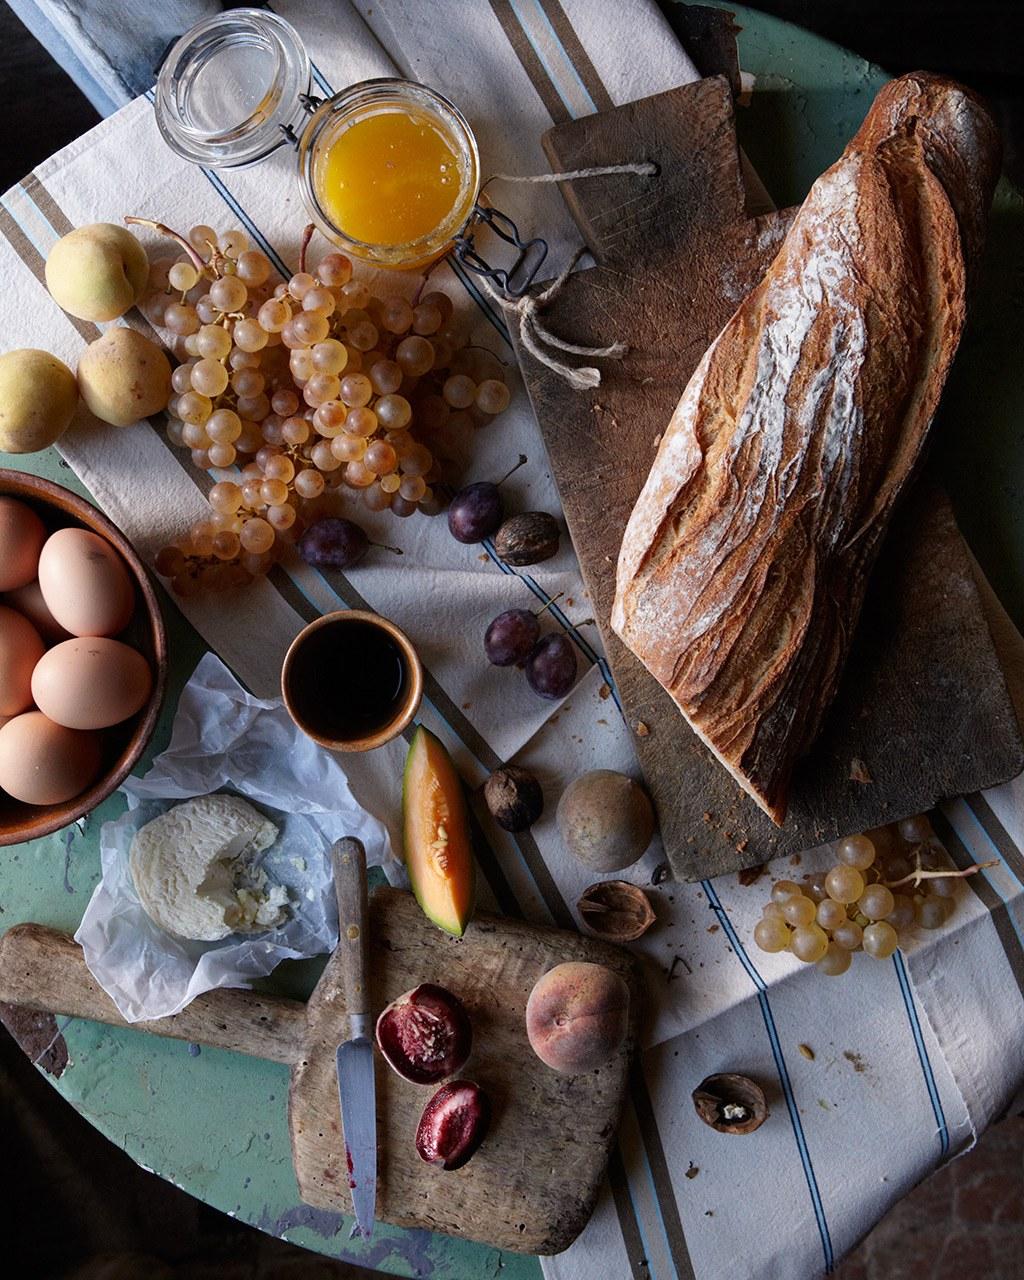 Magret Canard Foie Gras Four gascony: france's new foodie destination - la beaujardine